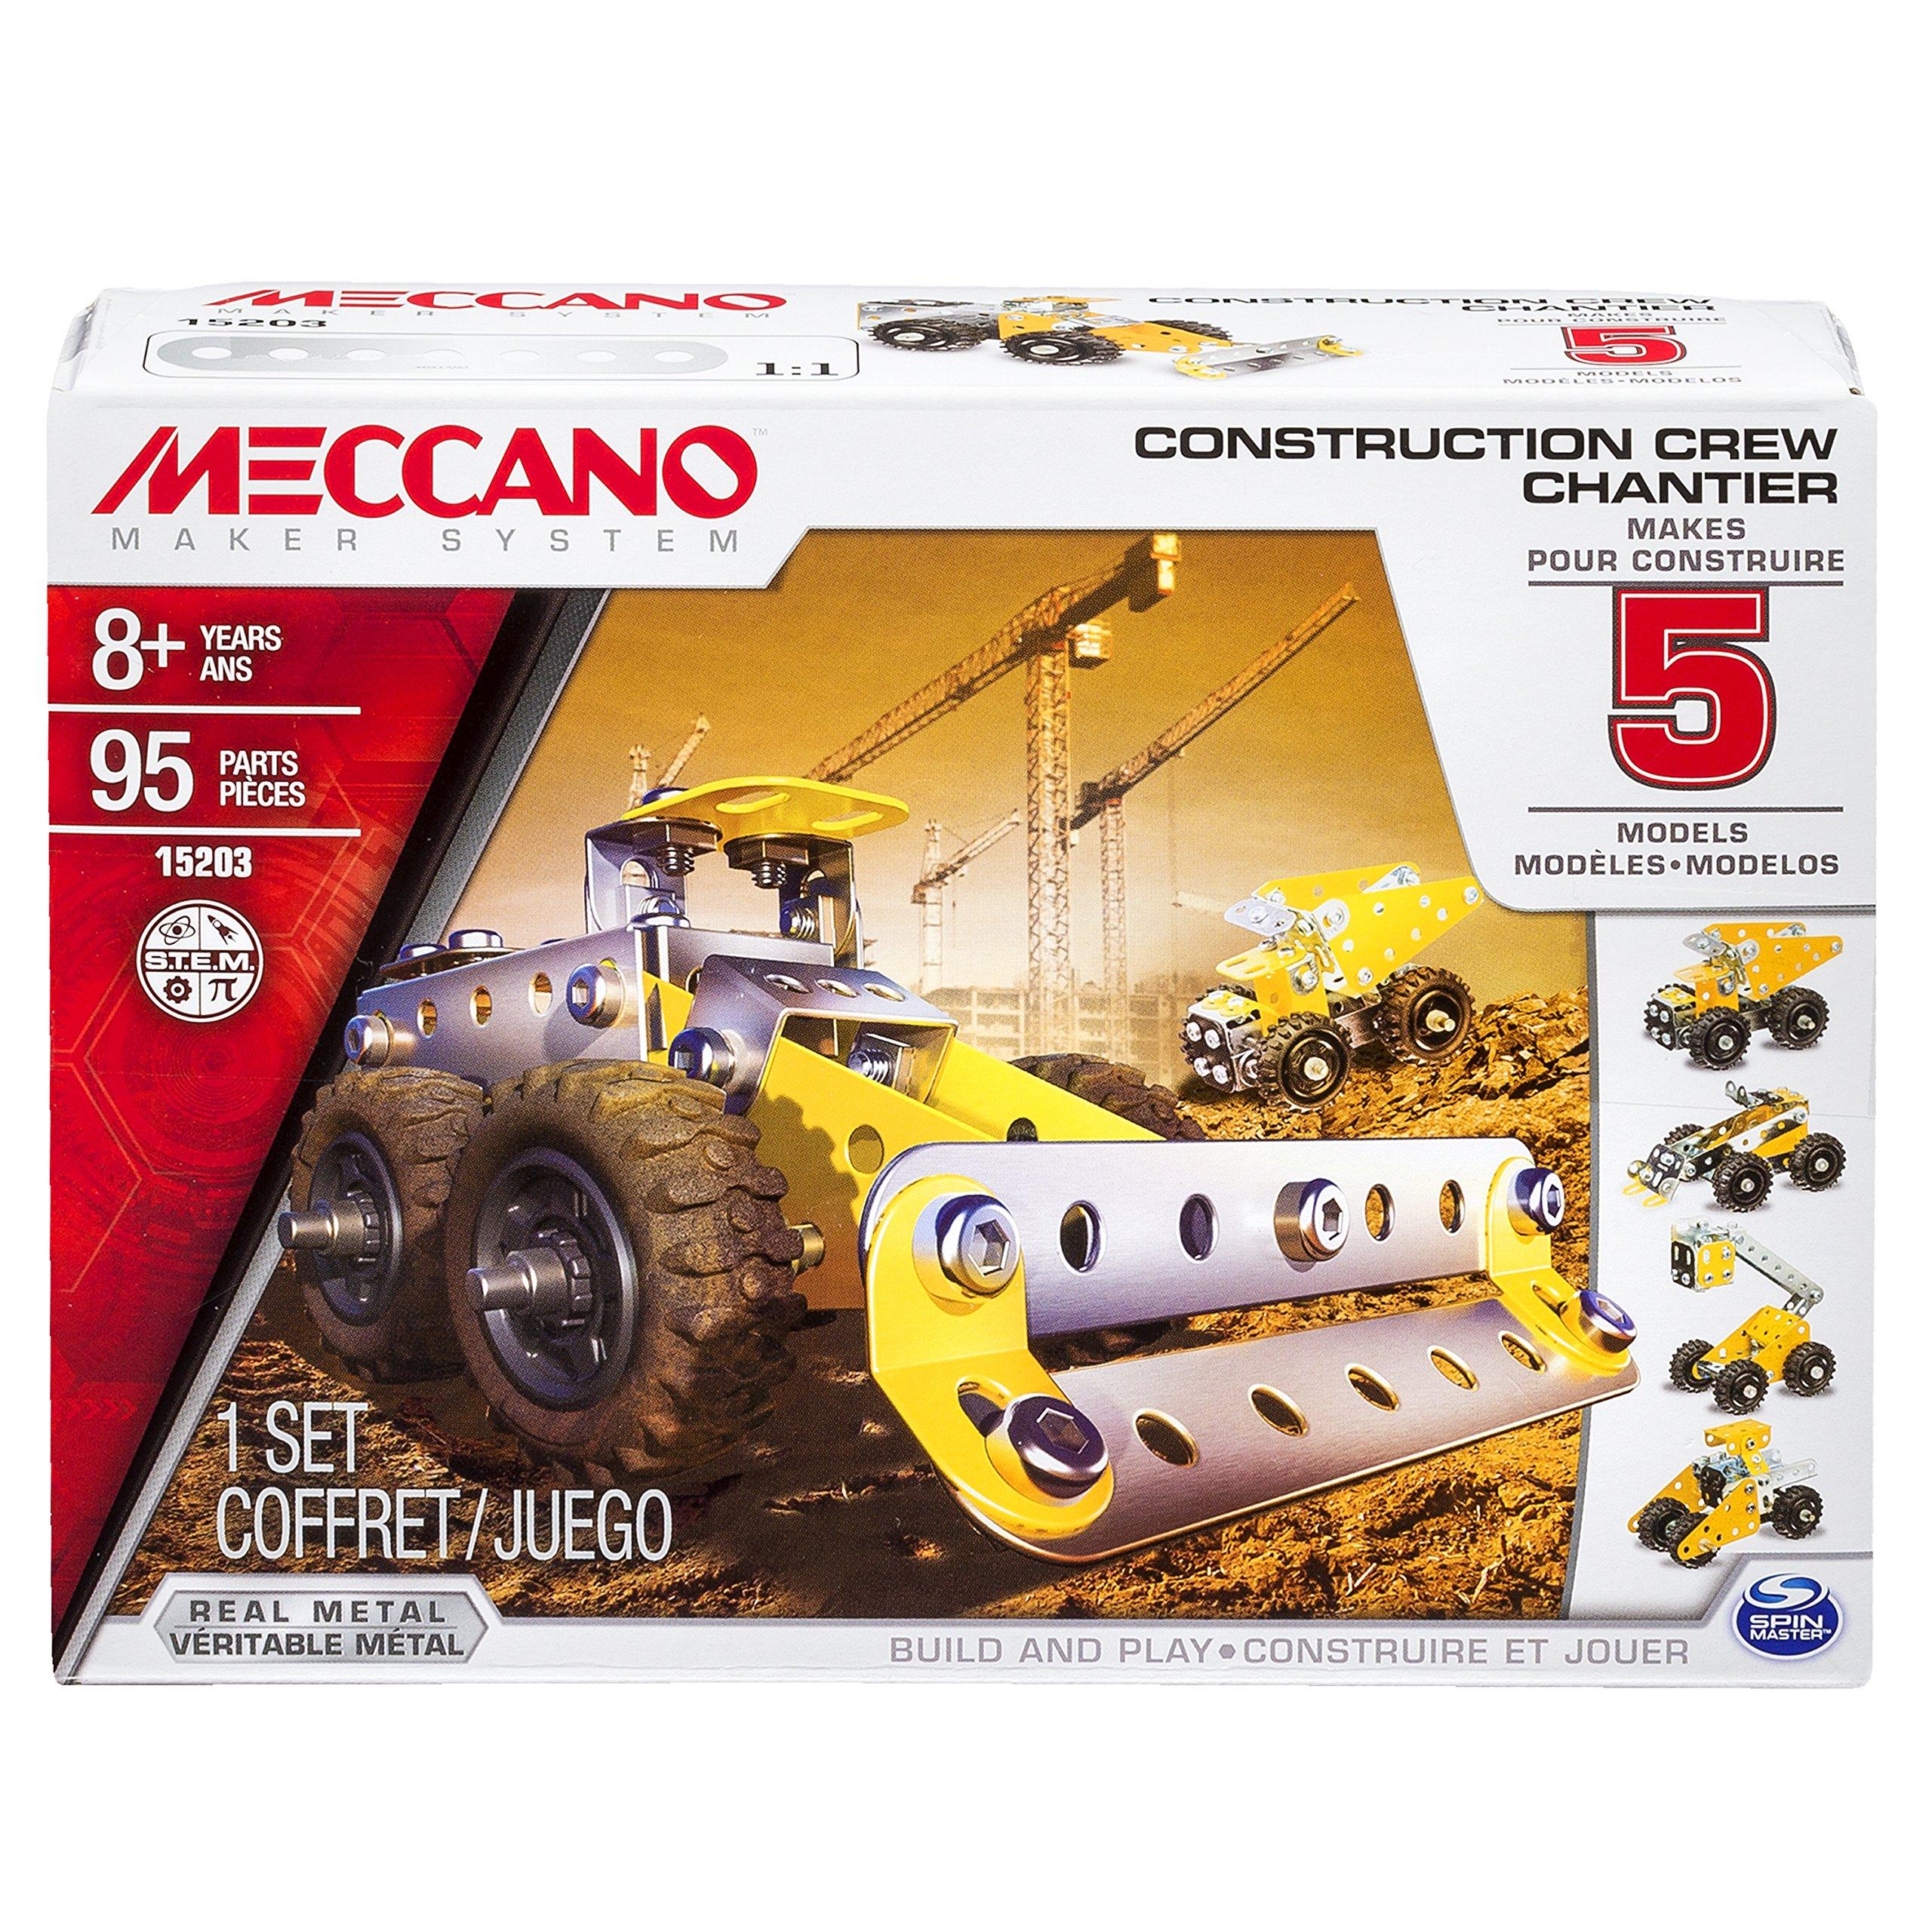 Meccano Crew